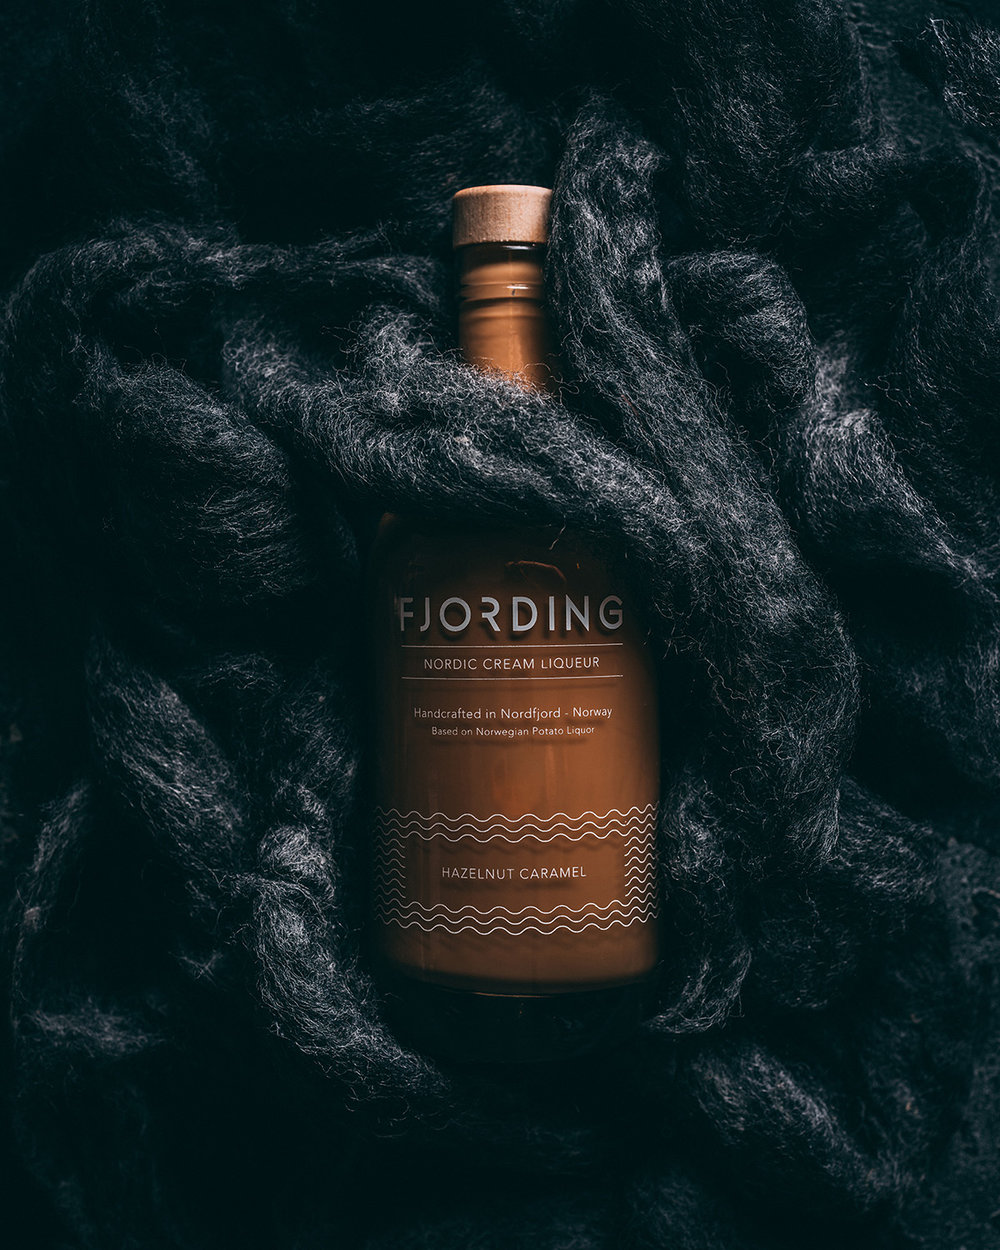 Fjording produktfoto mats dreyer fotograf stylist interiør styling